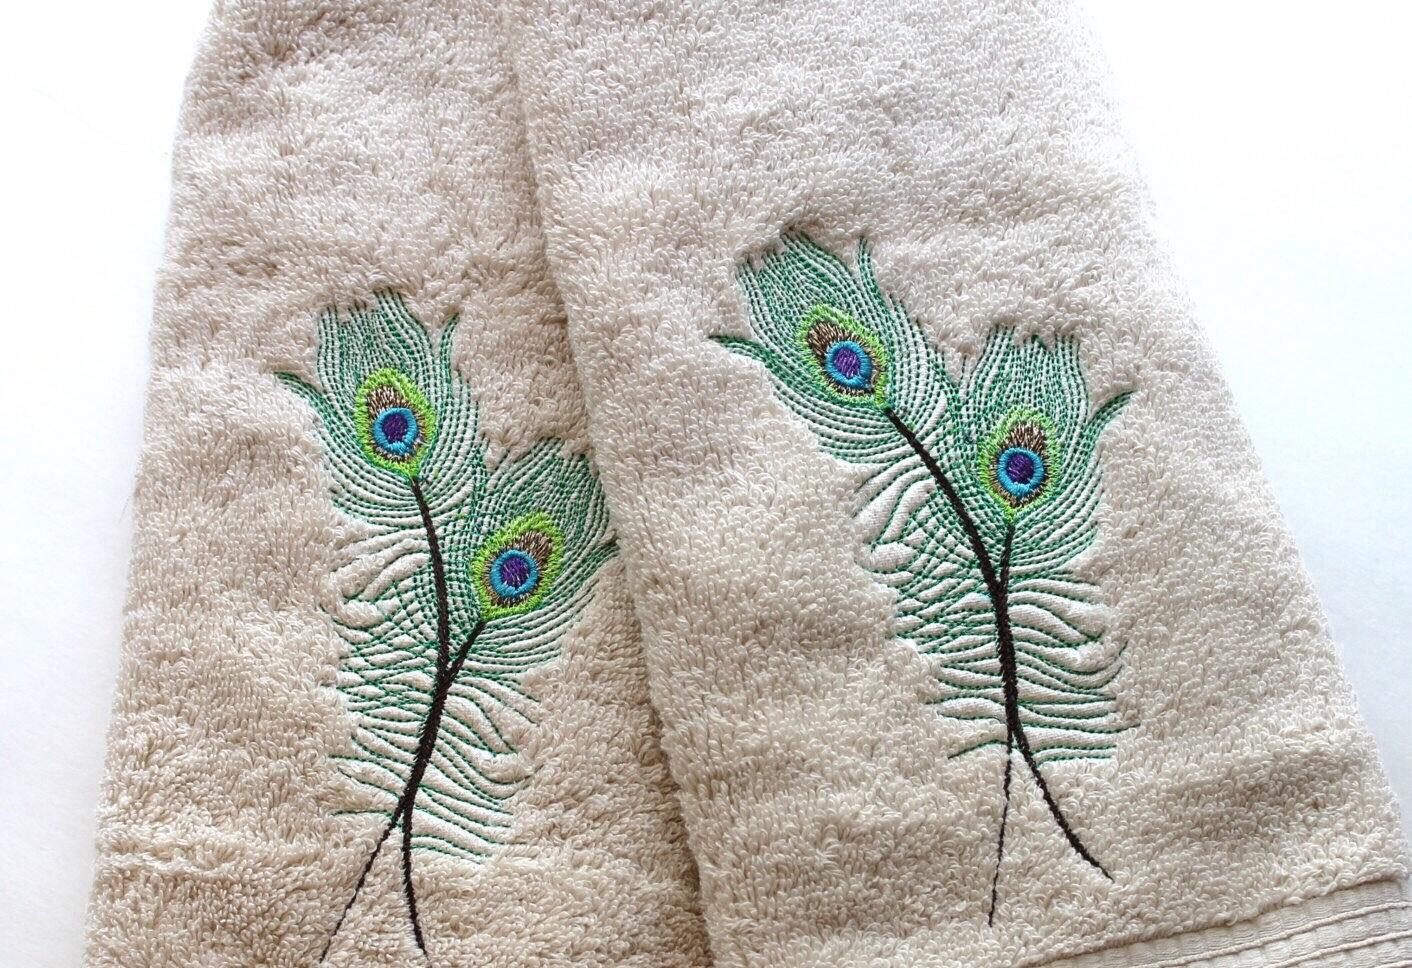 Peacock bathroom towels - Peacock Bath Towels Bath Towels Peacock Peacock Feather Towel Sets Hand